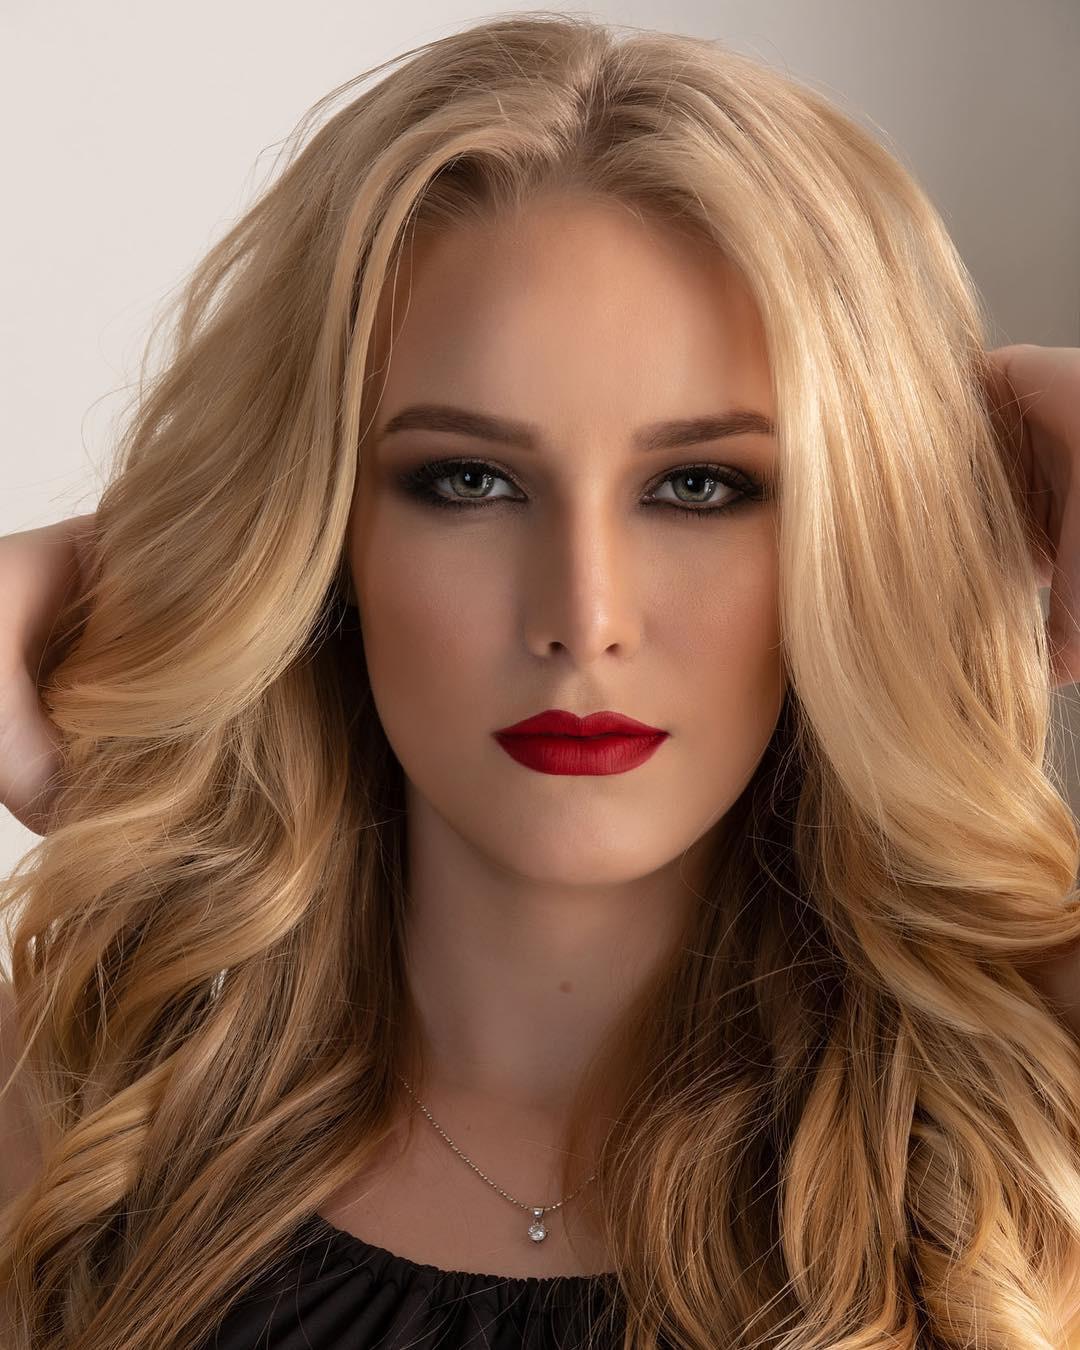 elizama aguilar, top 5 de miss brasil mundo 2019. - Página 6 Bdfleg10